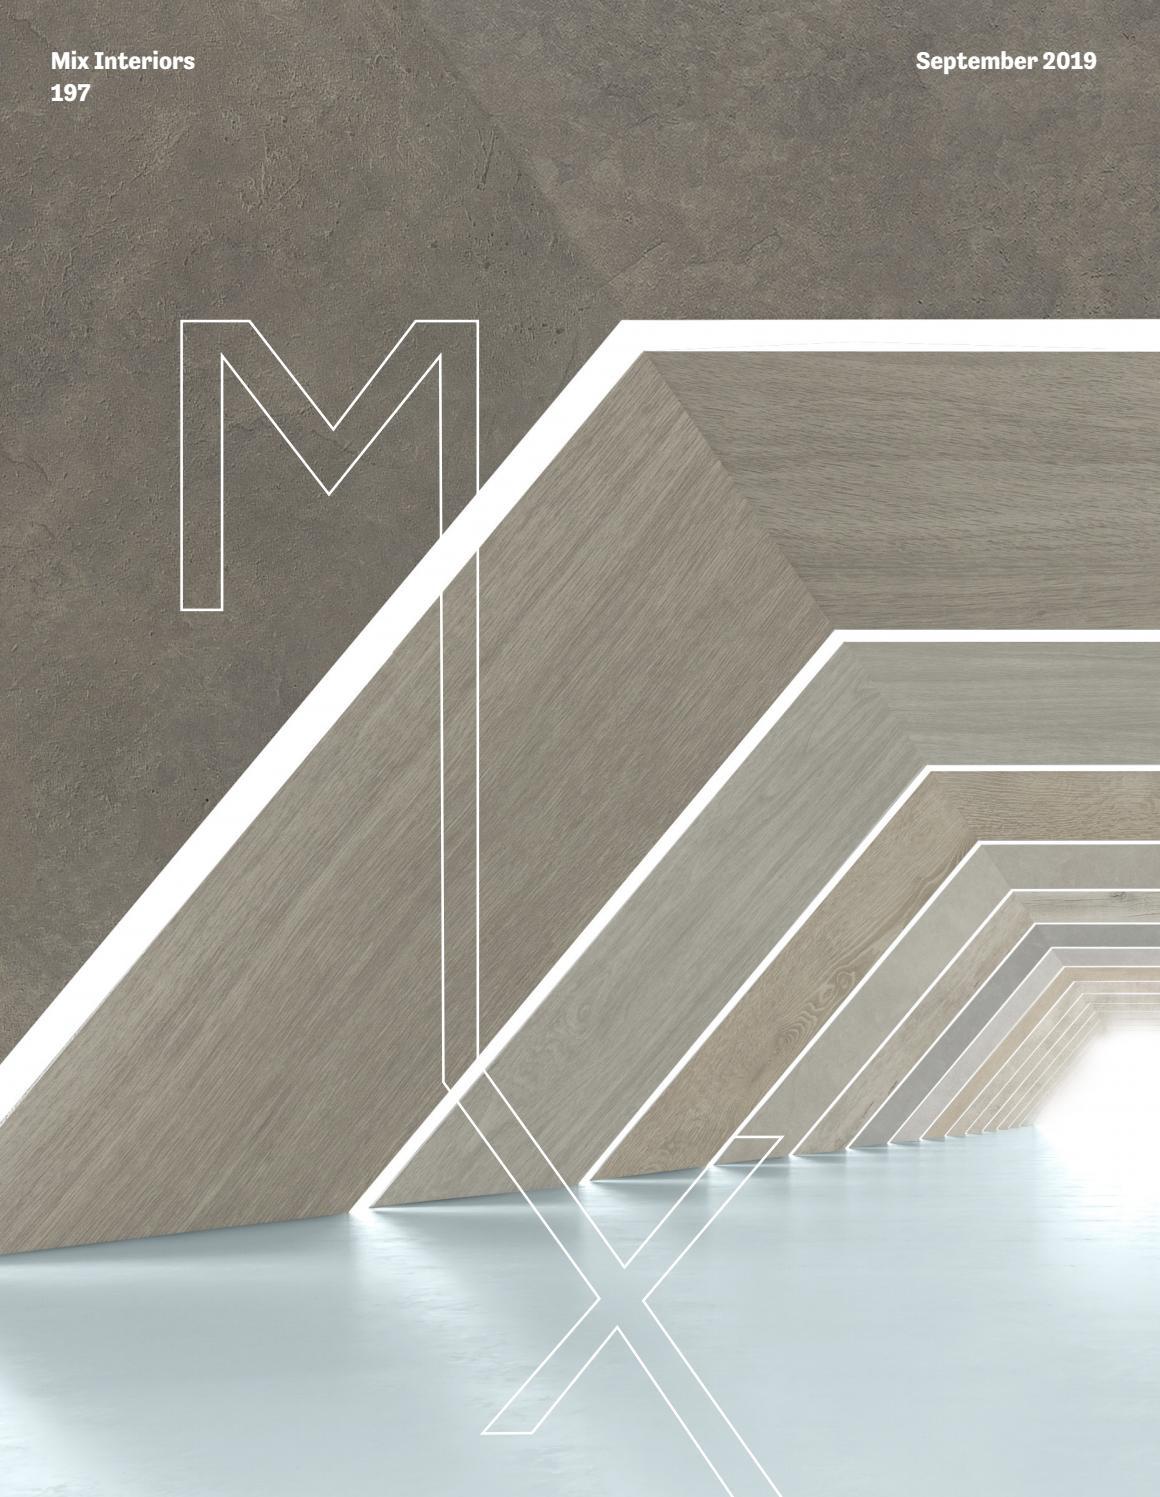 Mix Interiors 198 September 2019 By Mixinteriors Issuu